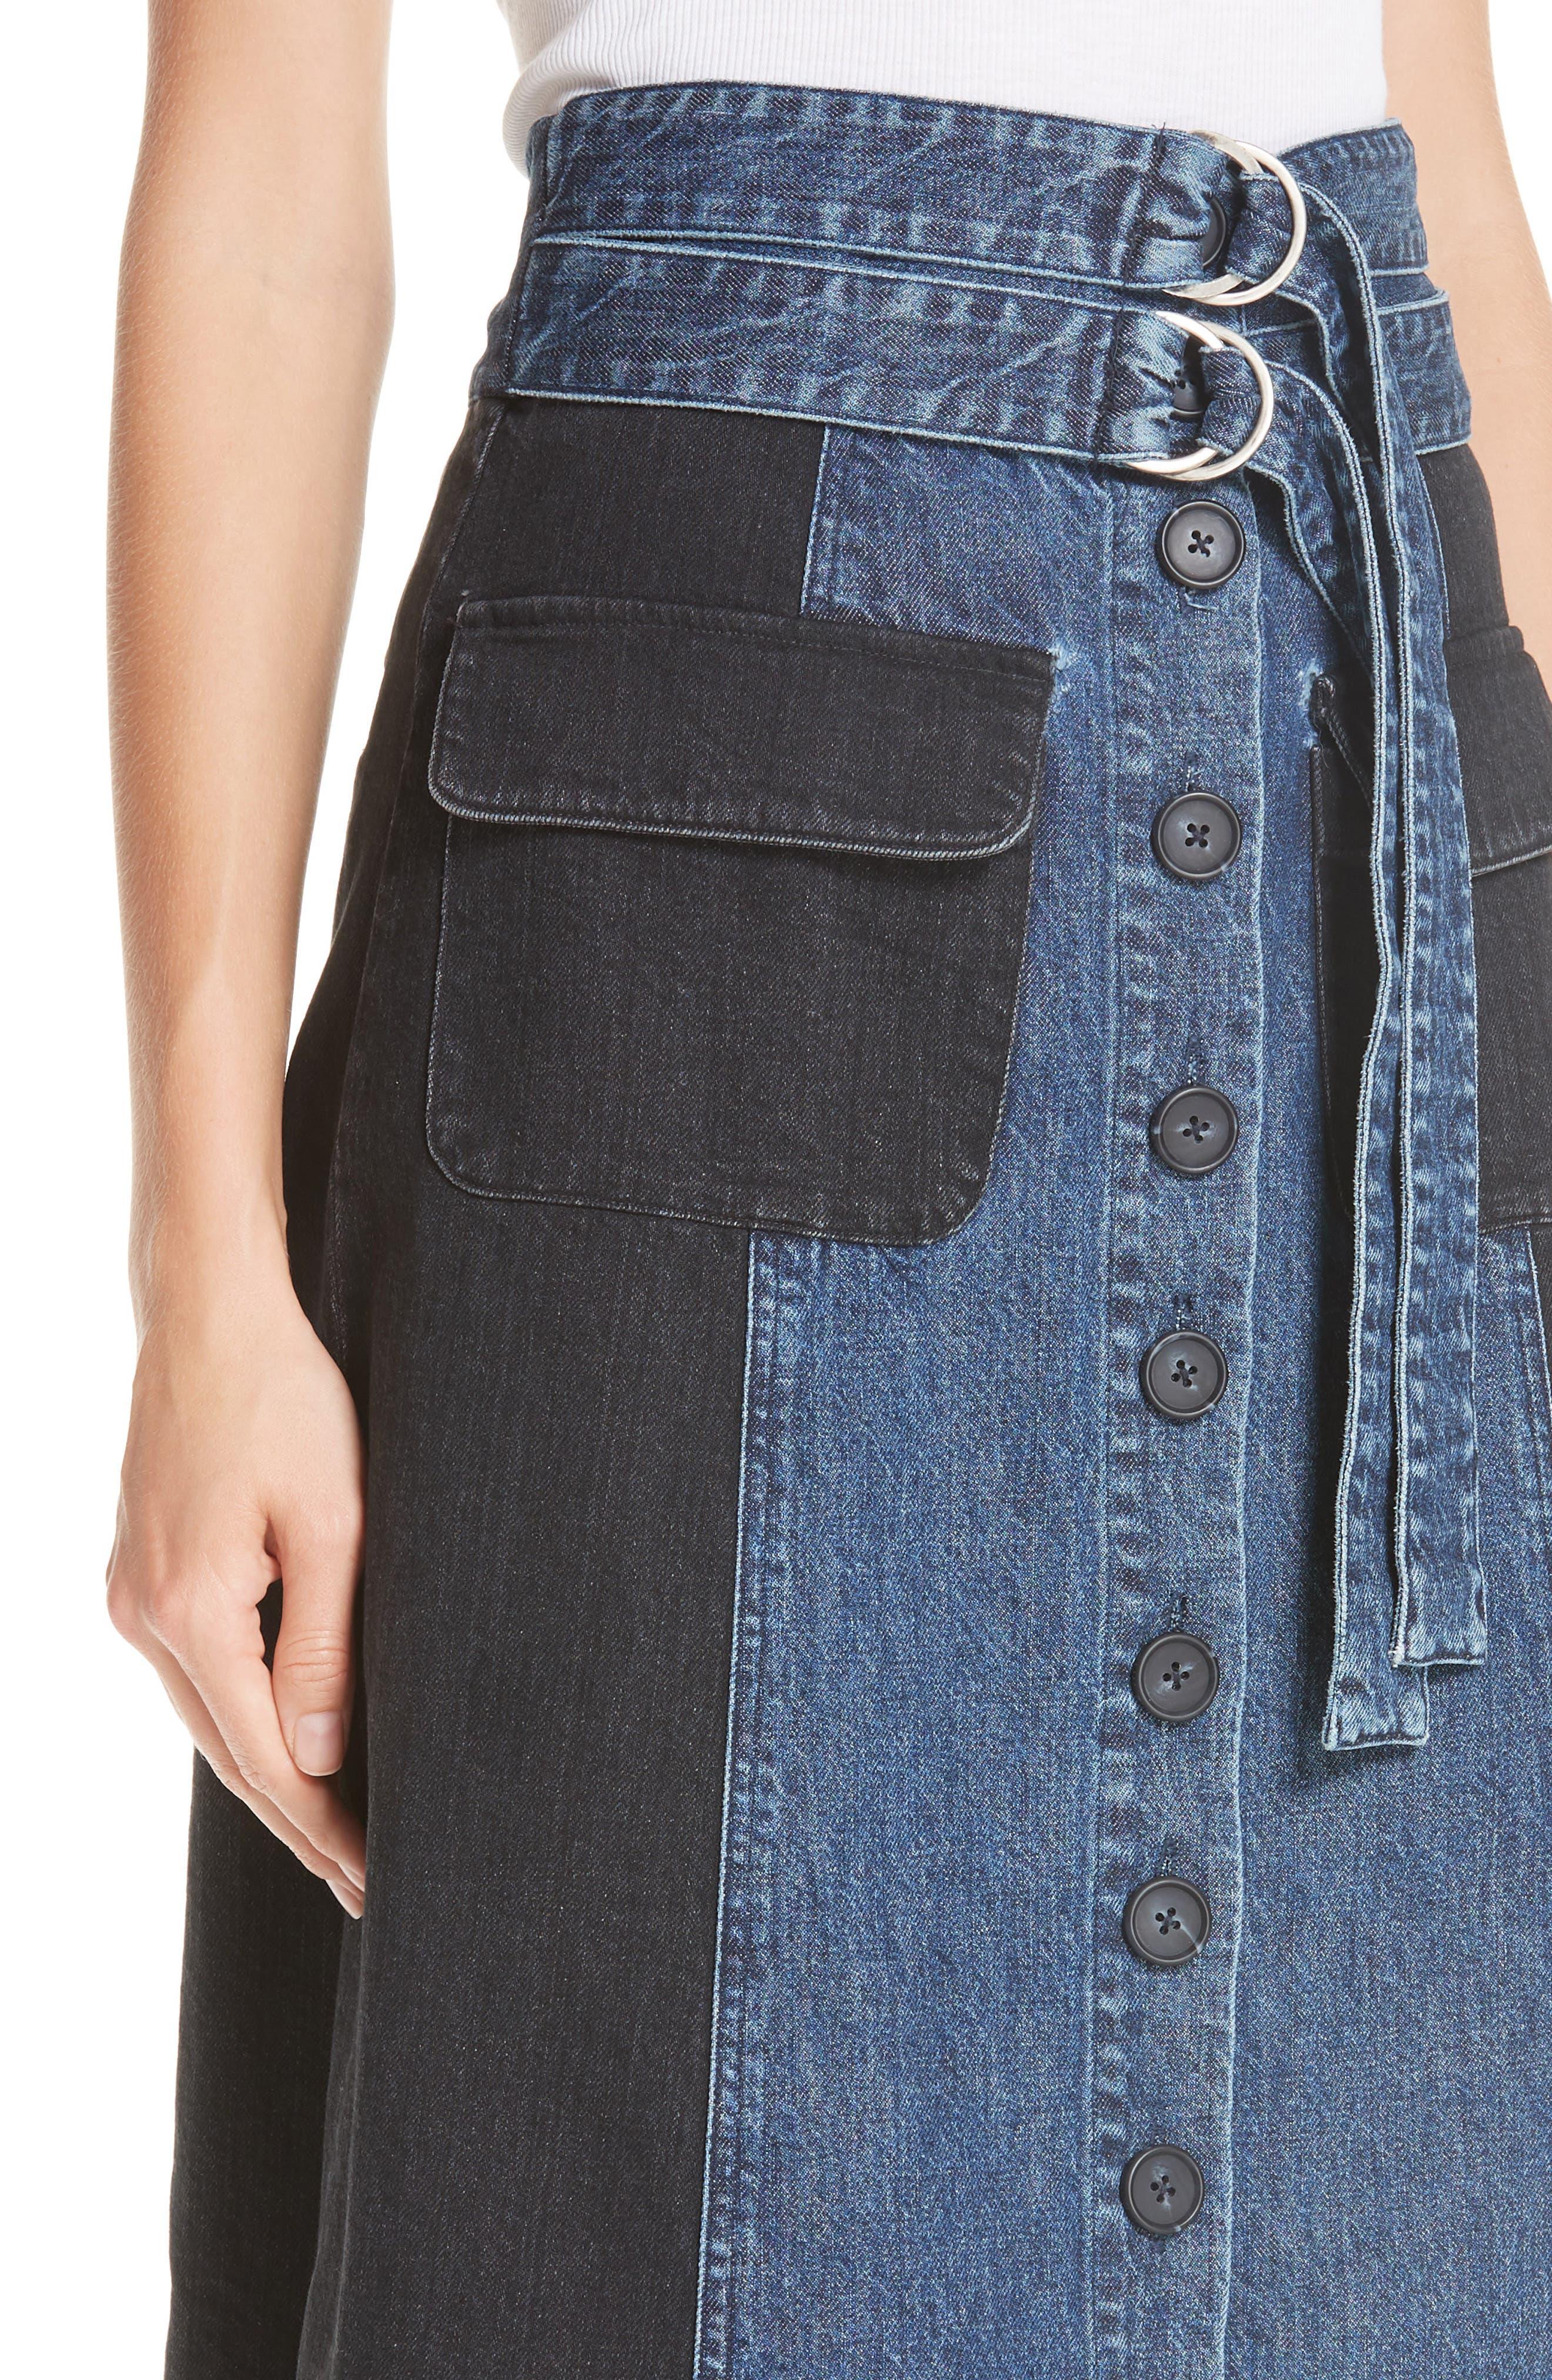 Bleu Bicolor Denim Midi Skirt,                             Alternate thumbnail 4, color,                             INDIGO/ BLACK